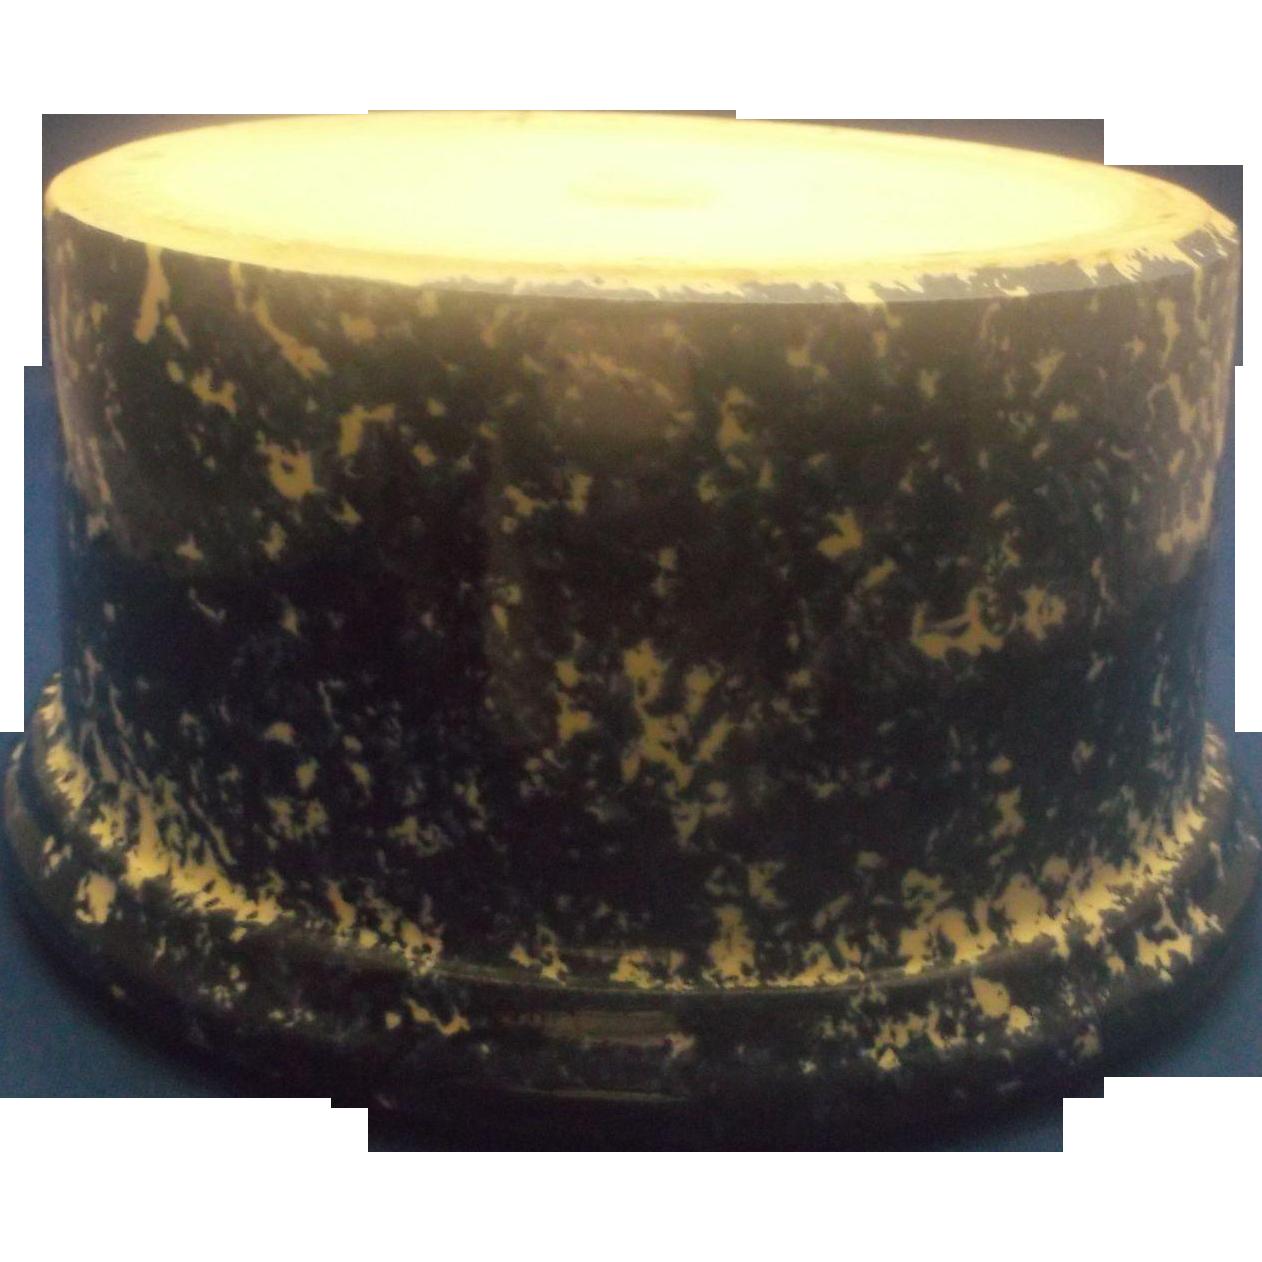 Cobalt Blue Spongeware Sponge Ware Crock Made in Canada